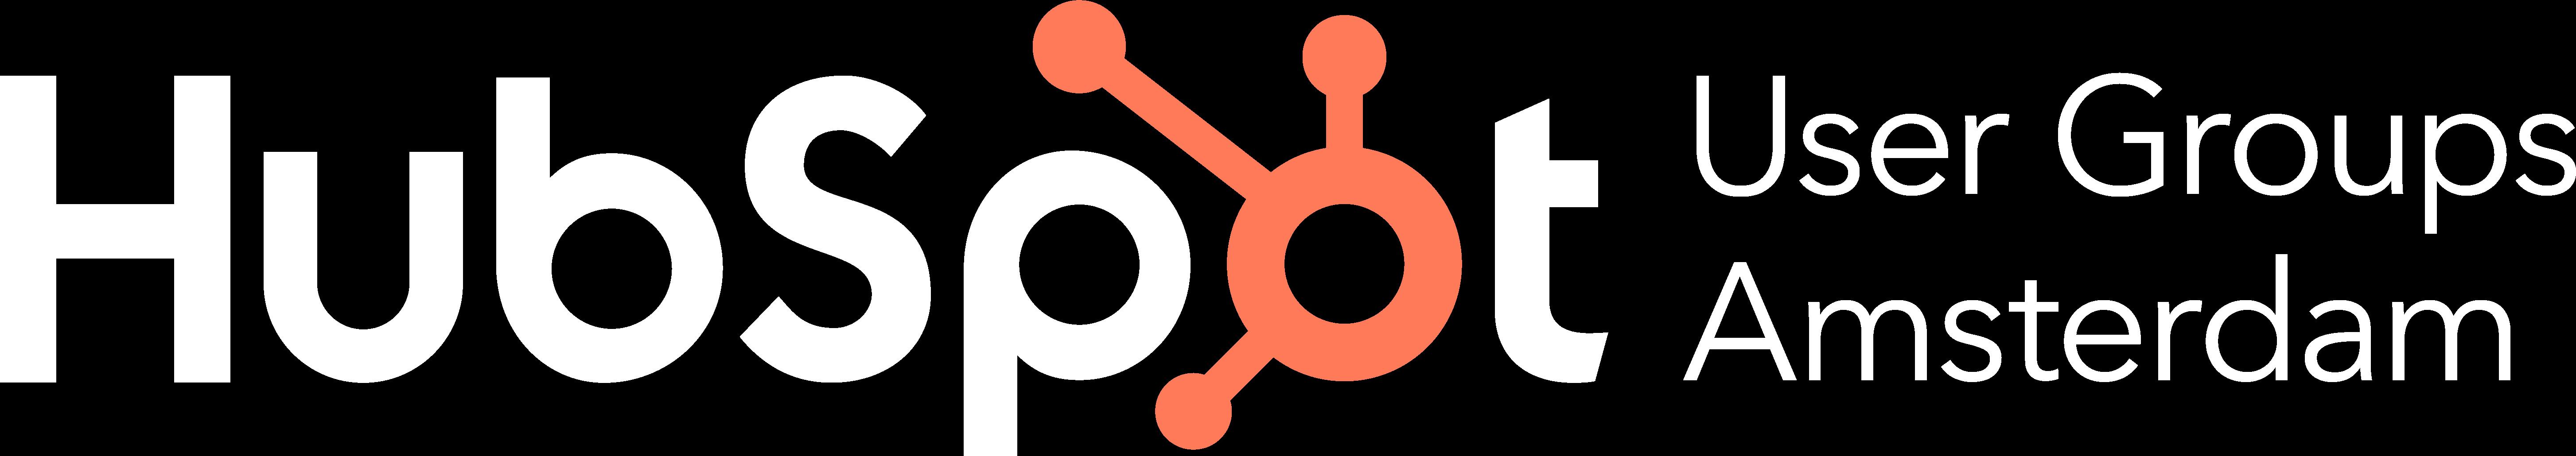 HubSpot_User_Group_Amsterdam logo wit